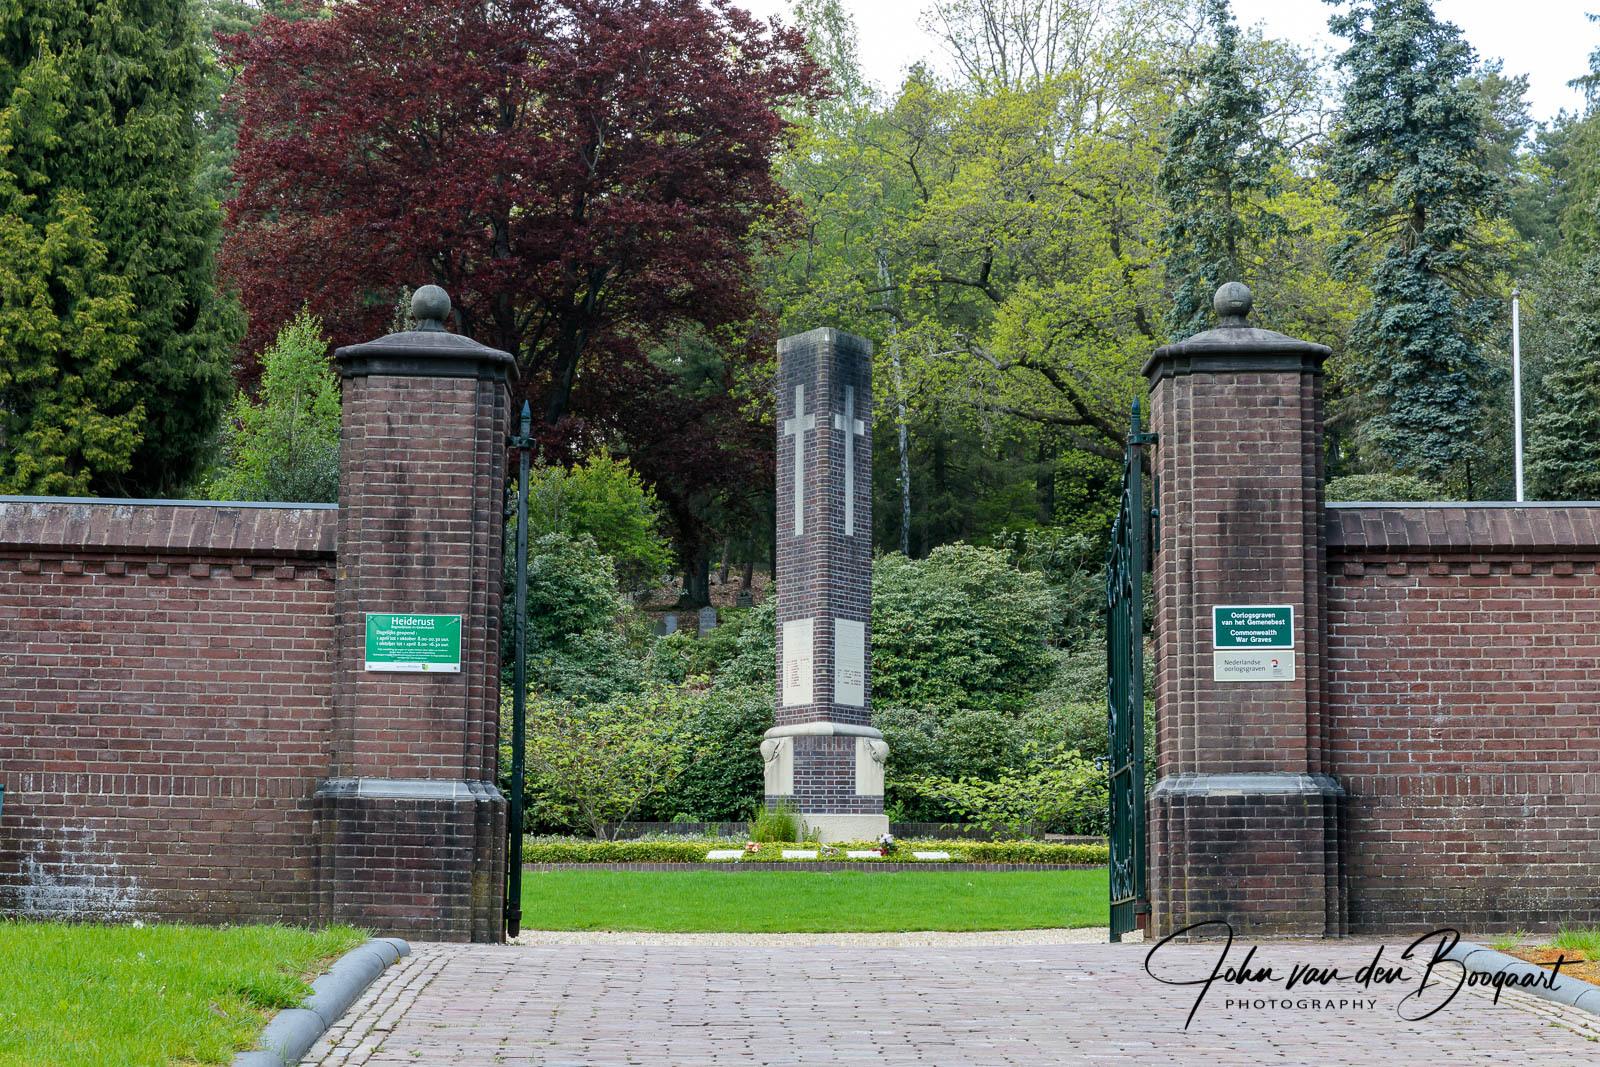 Rheden-Heiderust-ingang